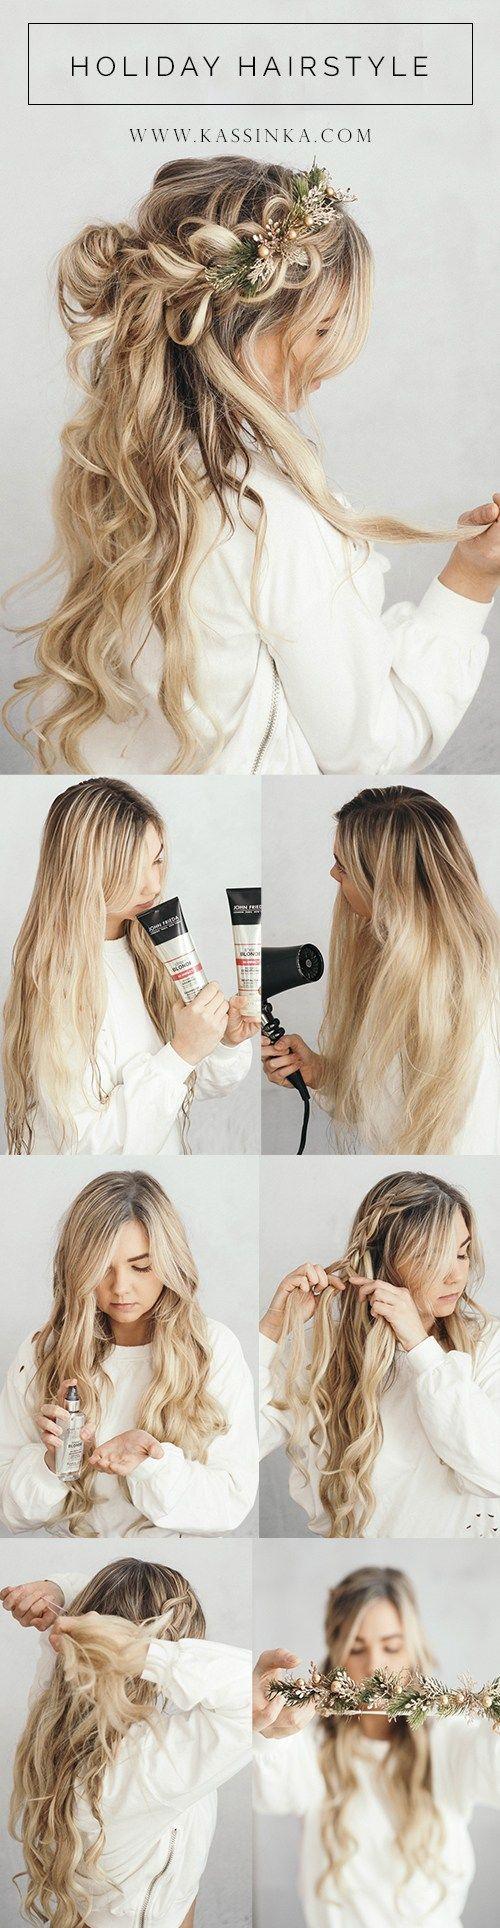 KASSINKA | Holiday Hair Tutorial With John Frieda | hair | Pinterest ...